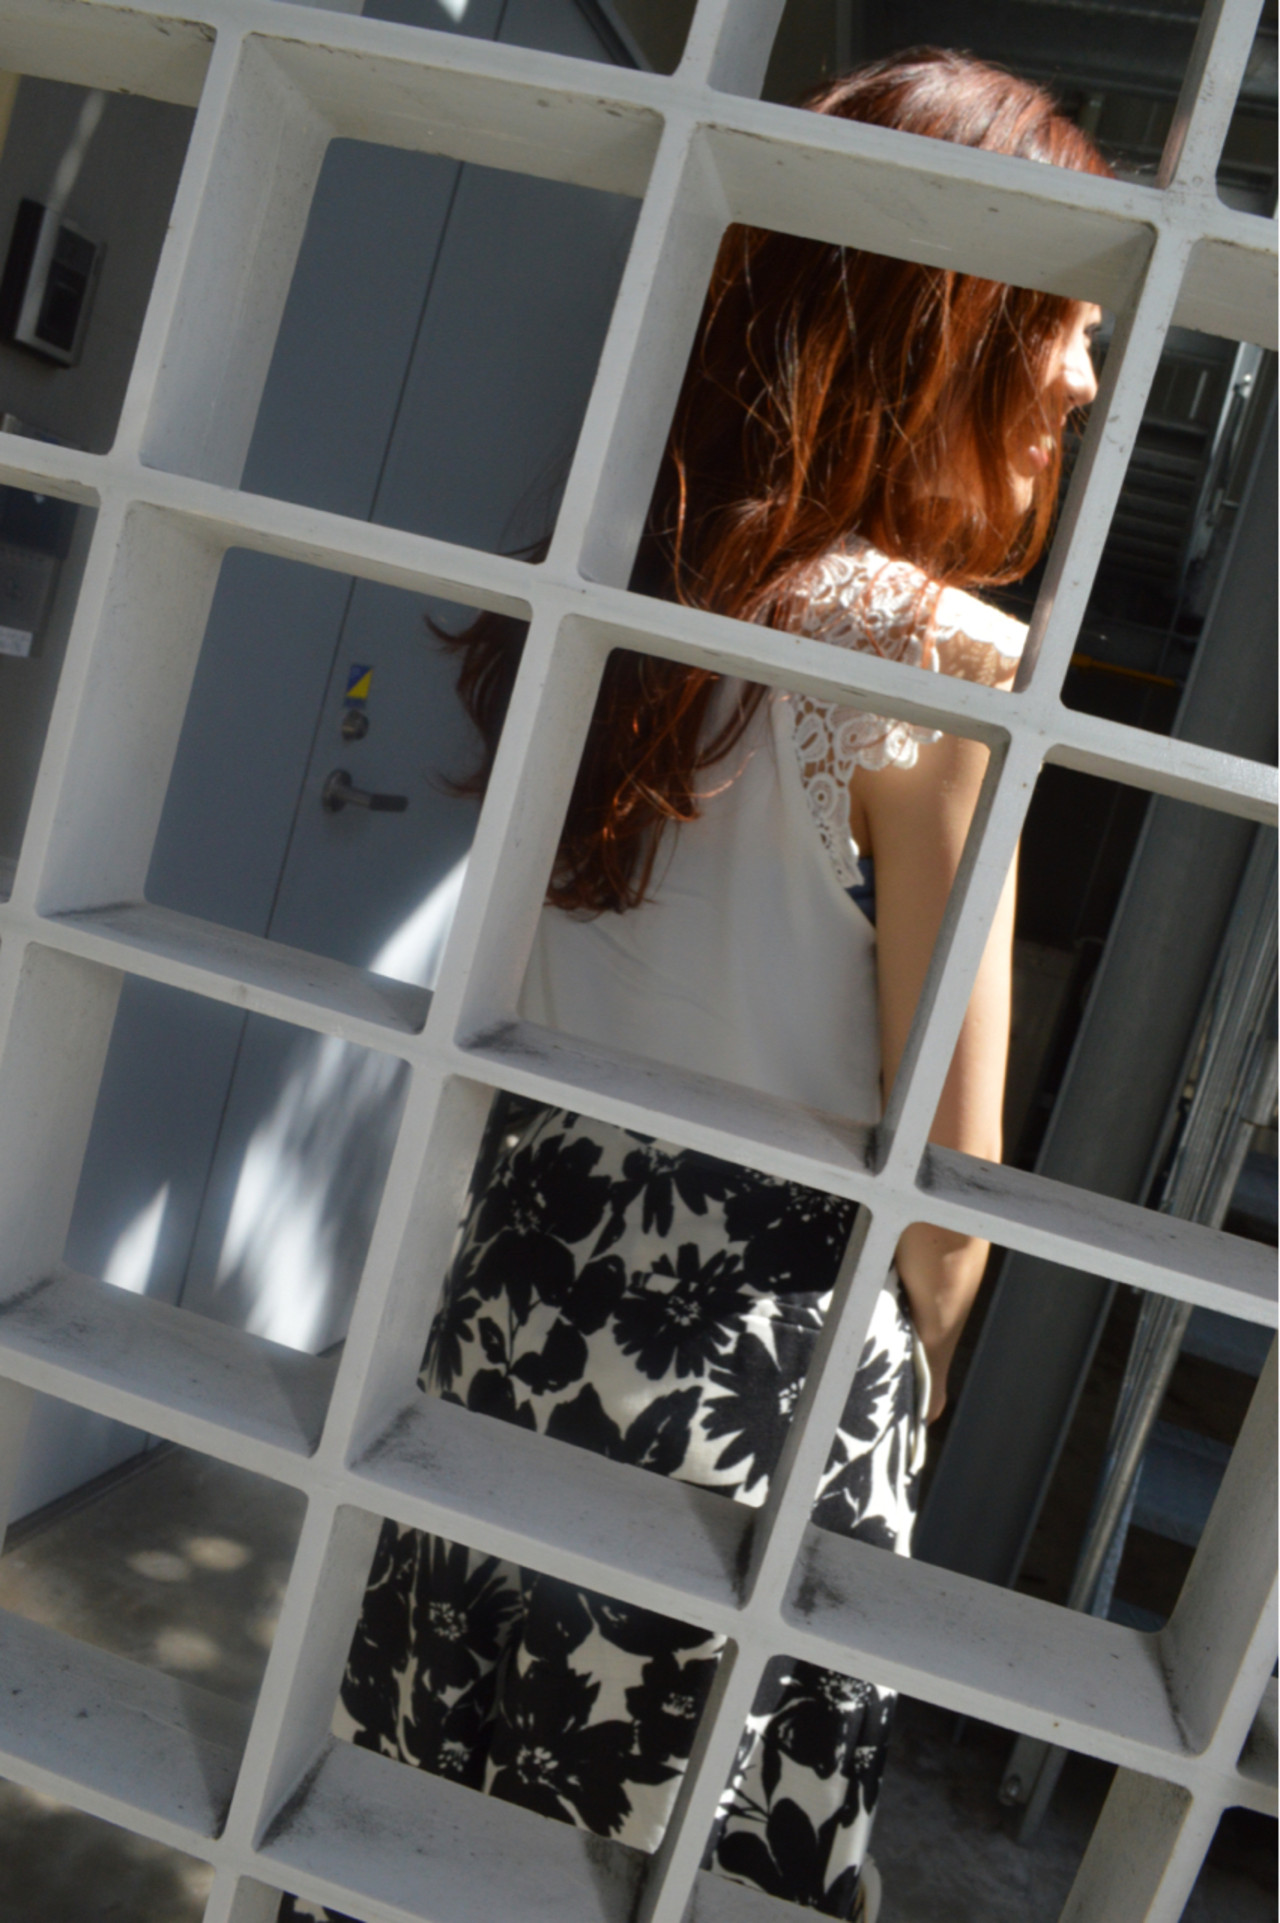 OL オフィス ロング オレンジ ヘアスタイルや髪型の写真・画像   カラーリスト・YuuKi Sekimoto / wherever